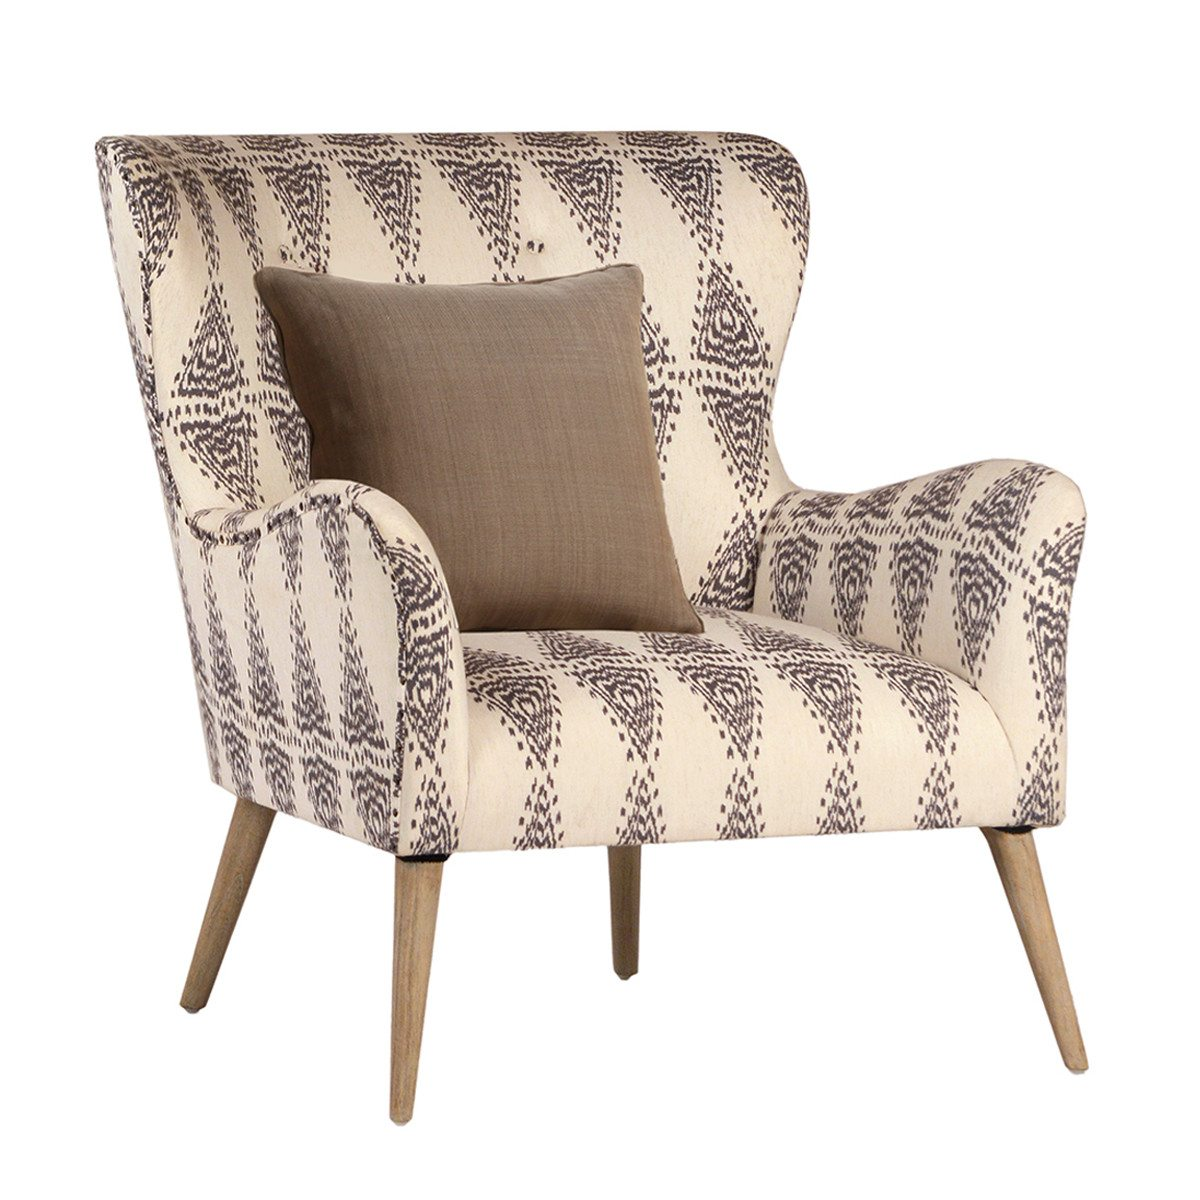 franklin-chair-shopceladon